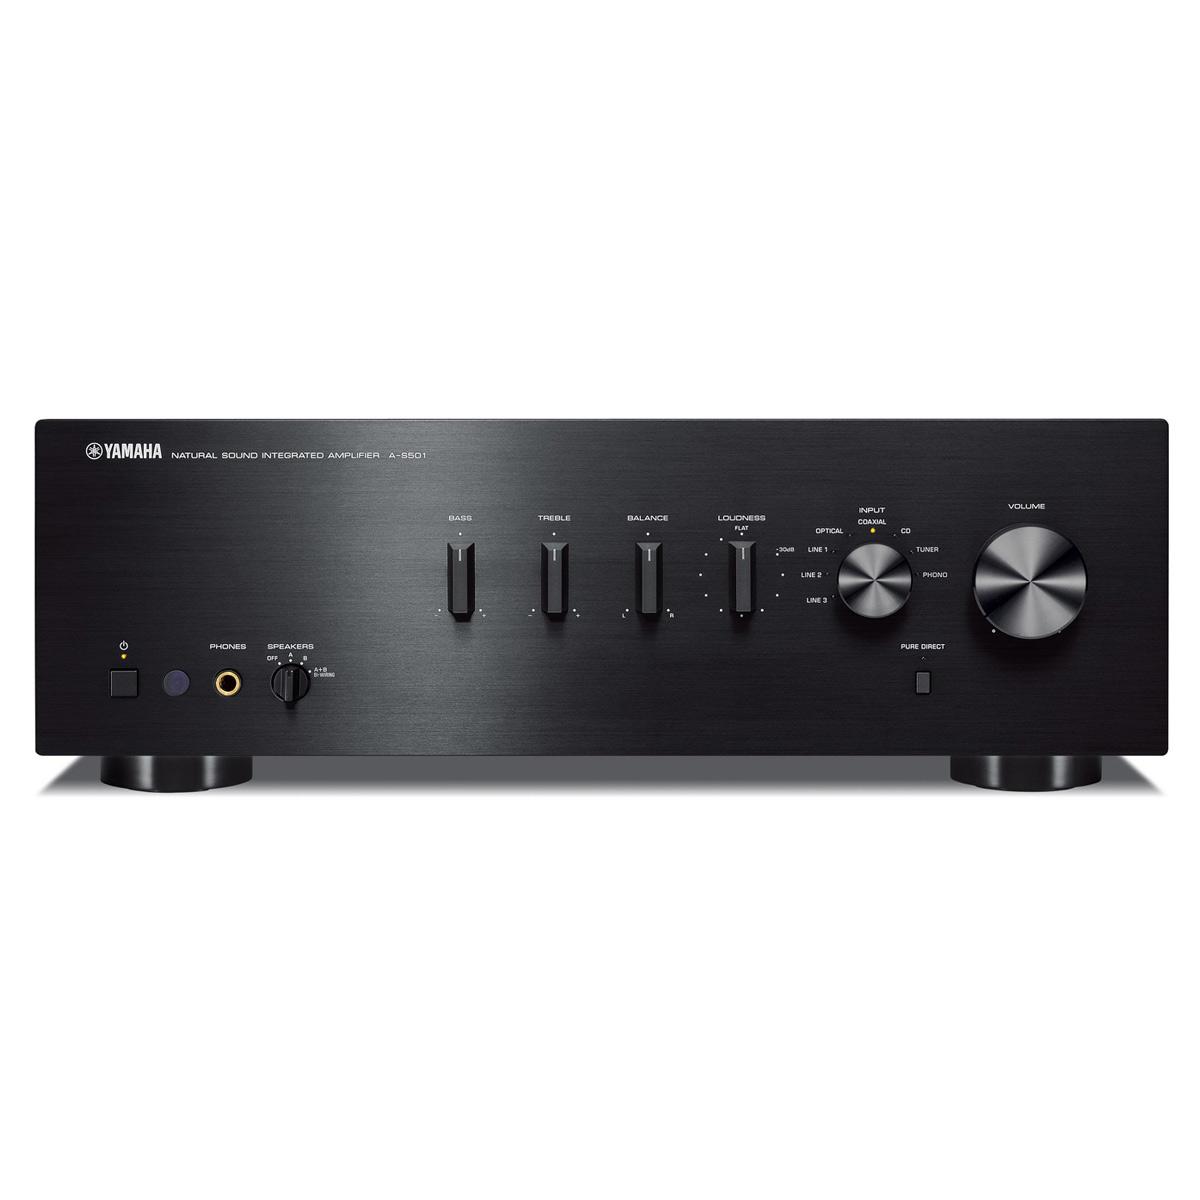 yamaha a s501 integrated amplifier ebay. Black Bedroom Furniture Sets. Home Design Ideas